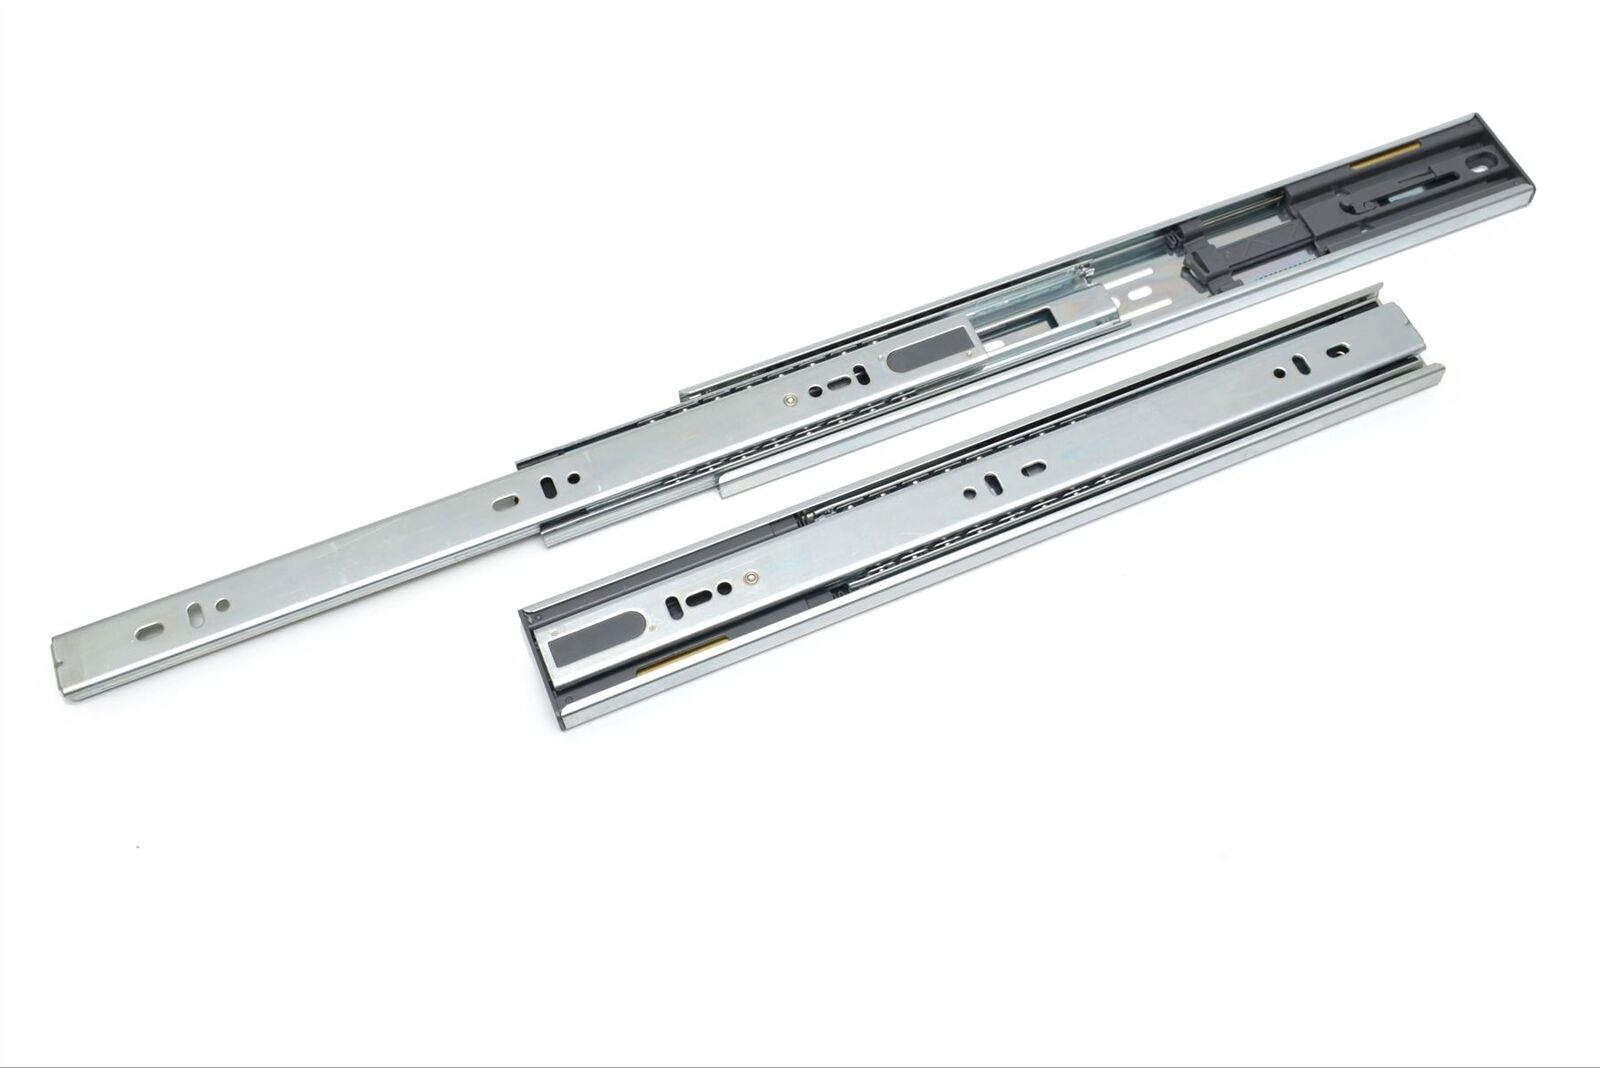 Box of 15 Drawer Runner H45 Push to open 500mm